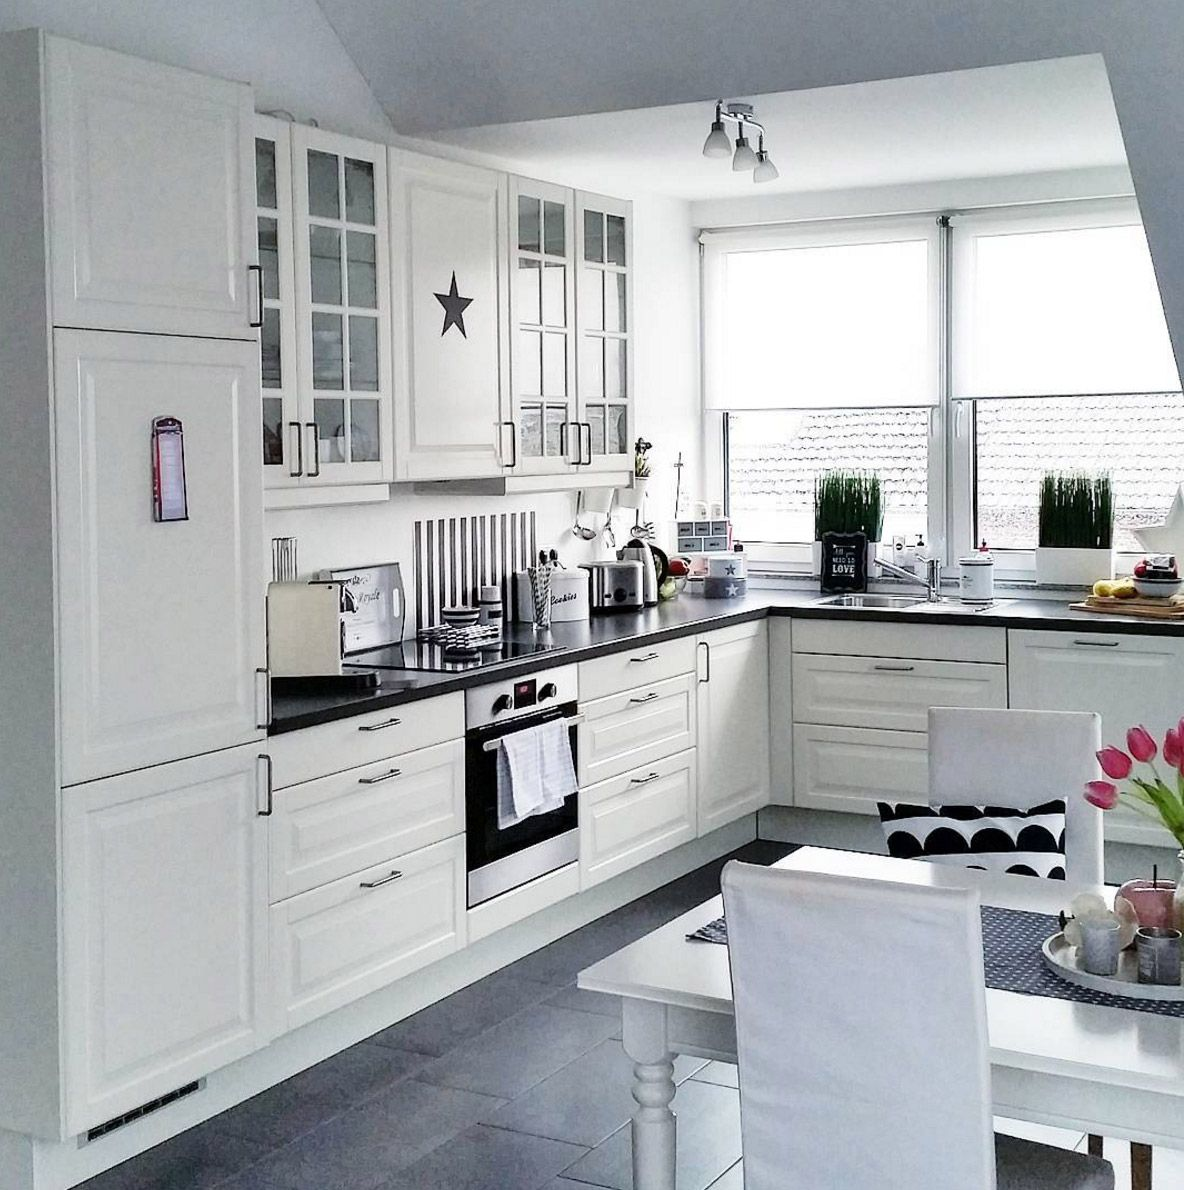 Küche Ikea Ideen | Groß Ikea Küche Hocker Aus Holz Galerie Küchen ...